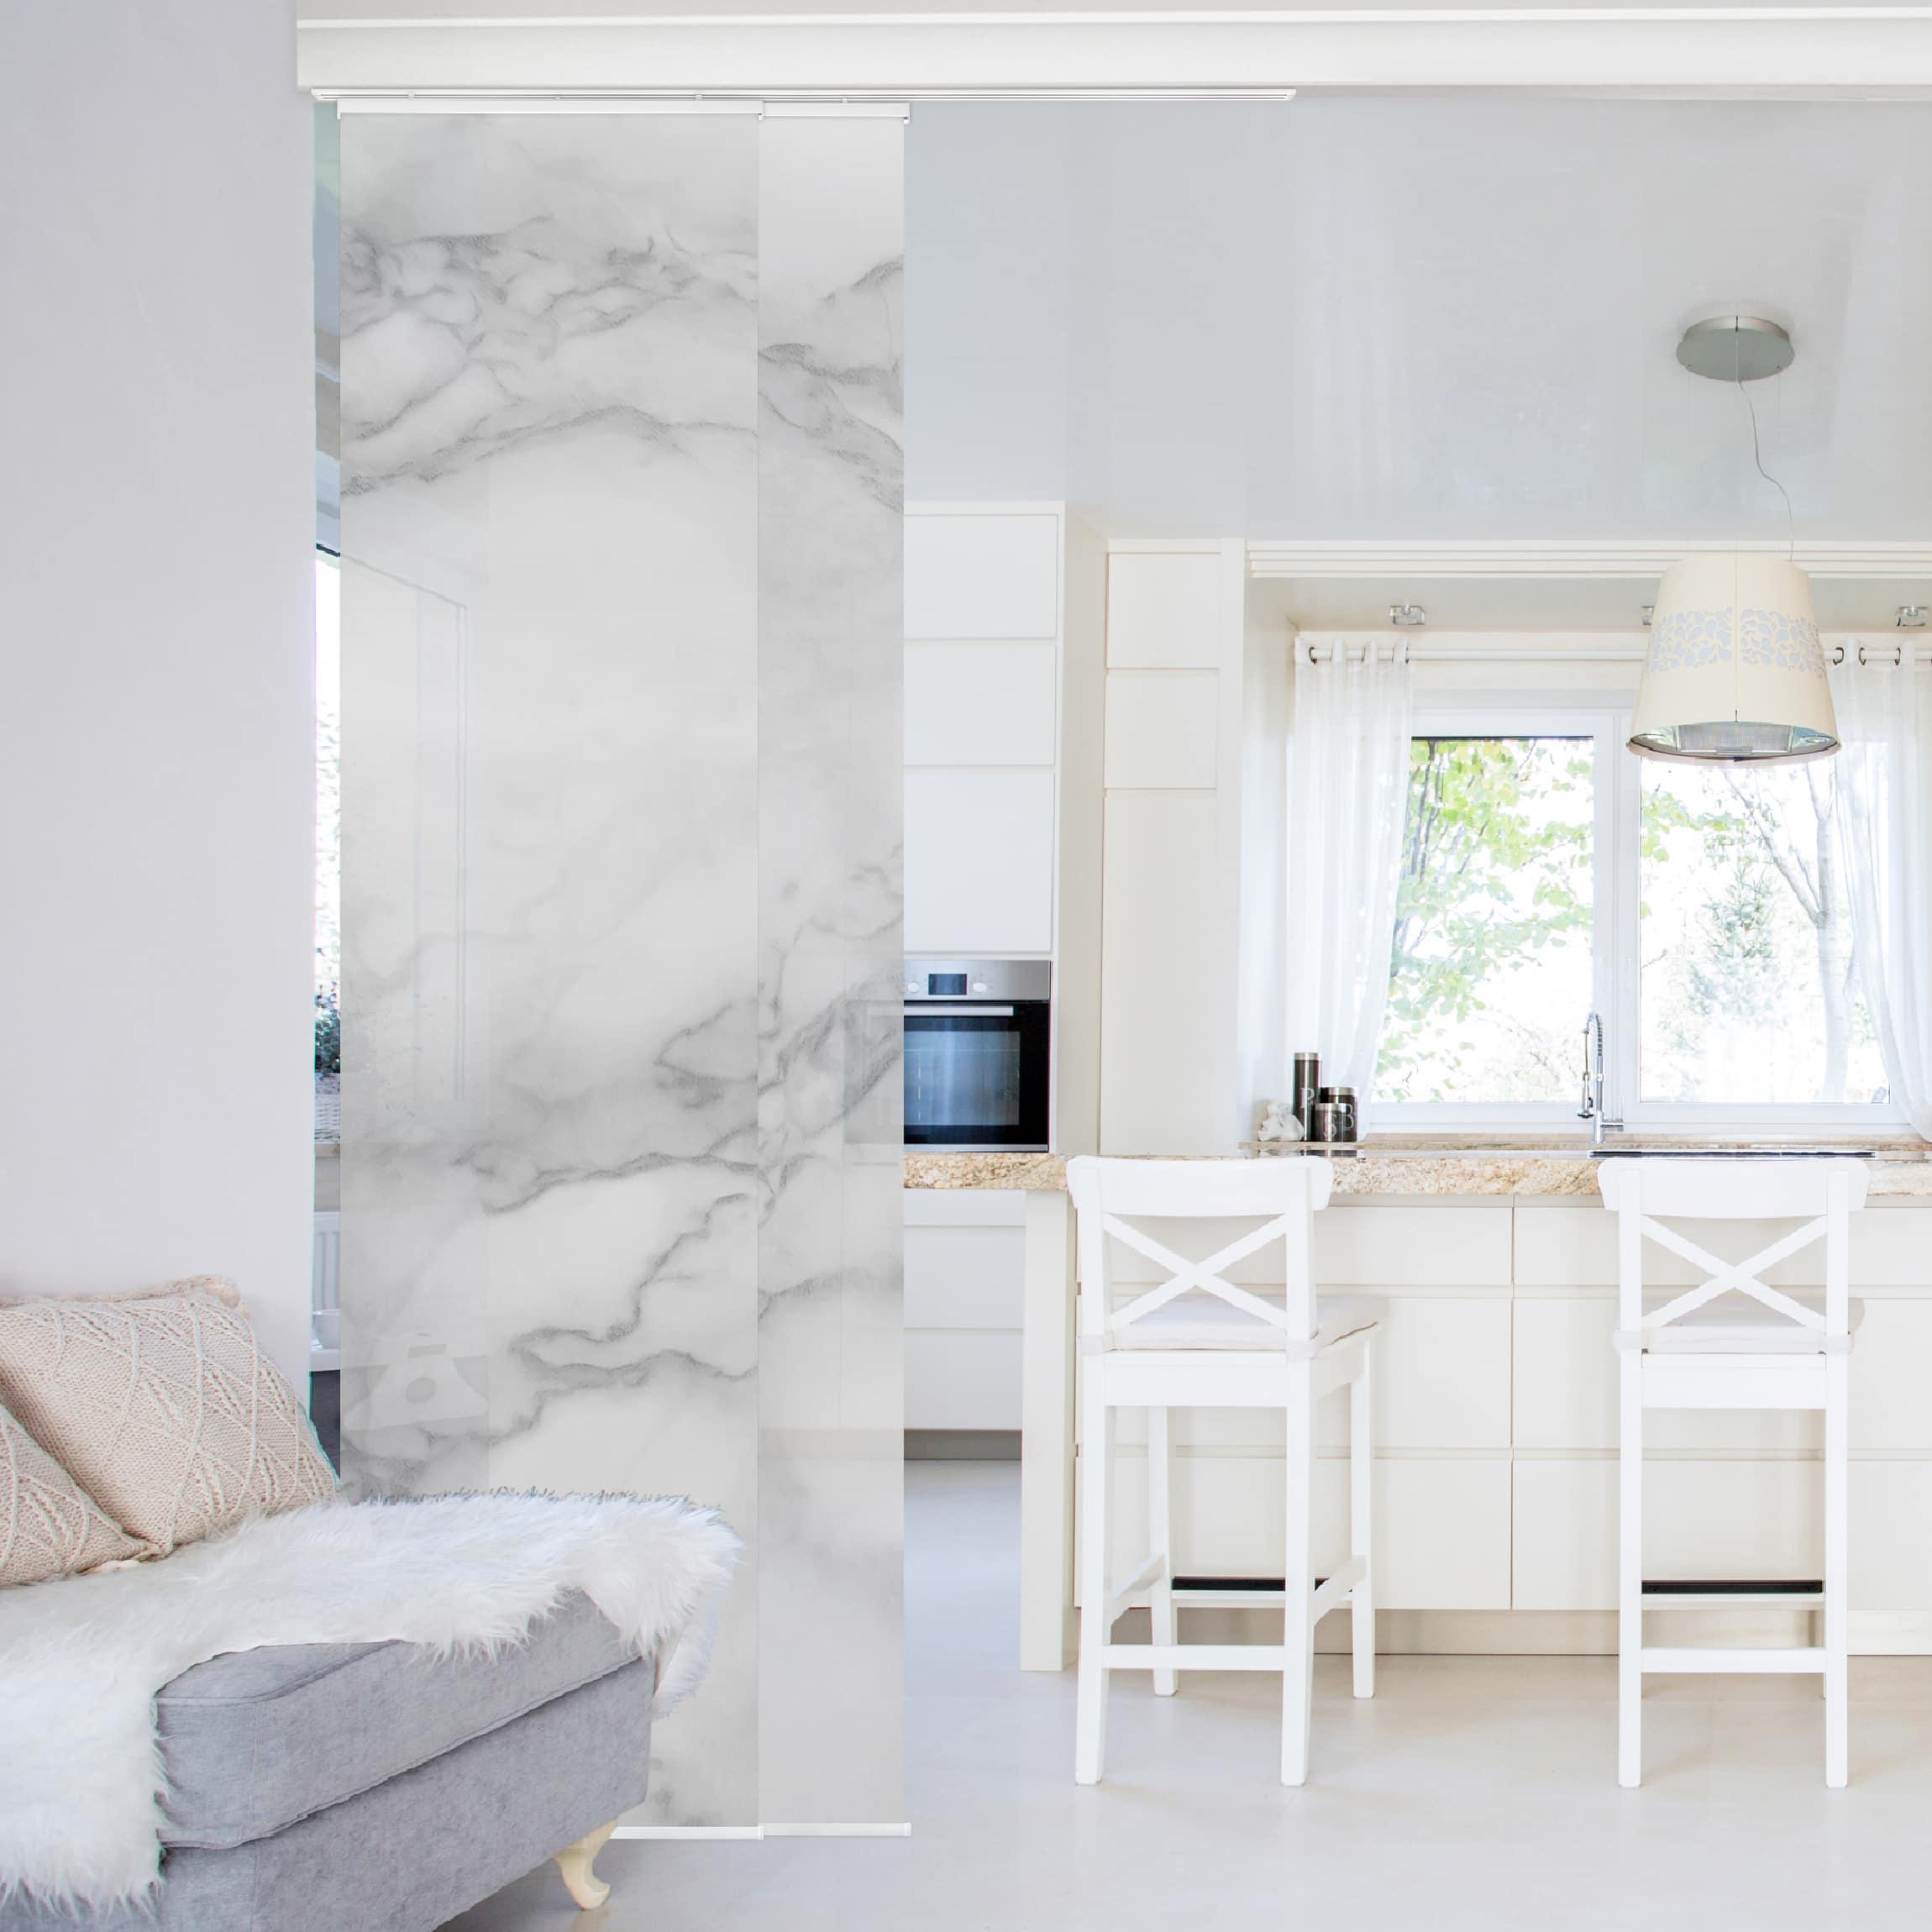 schiebegardinen set marmoroptik schwarz wei 2. Black Bedroom Furniture Sets. Home Design Ideas